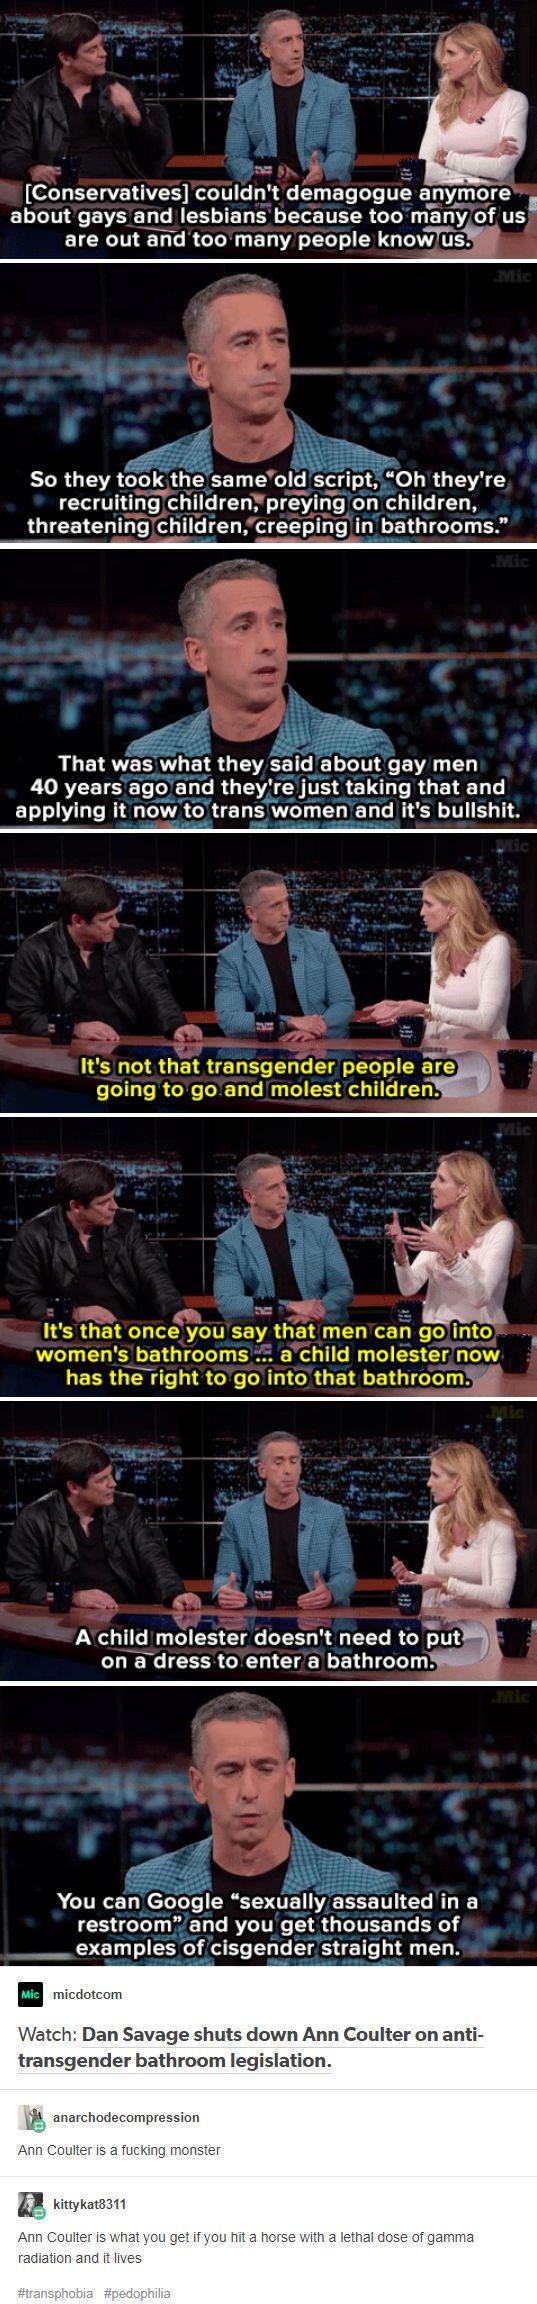 Dan Savage shuts down Ann Coulter on anti-transgender bathroom legislation. https://mic.com/articles/142978/watch-dan-savage-destroy-ann-coulter-on-anti-transgender-bathroom-legislation?utm_source=policymicTBLR&utm_medium=style&utm_campaign=social